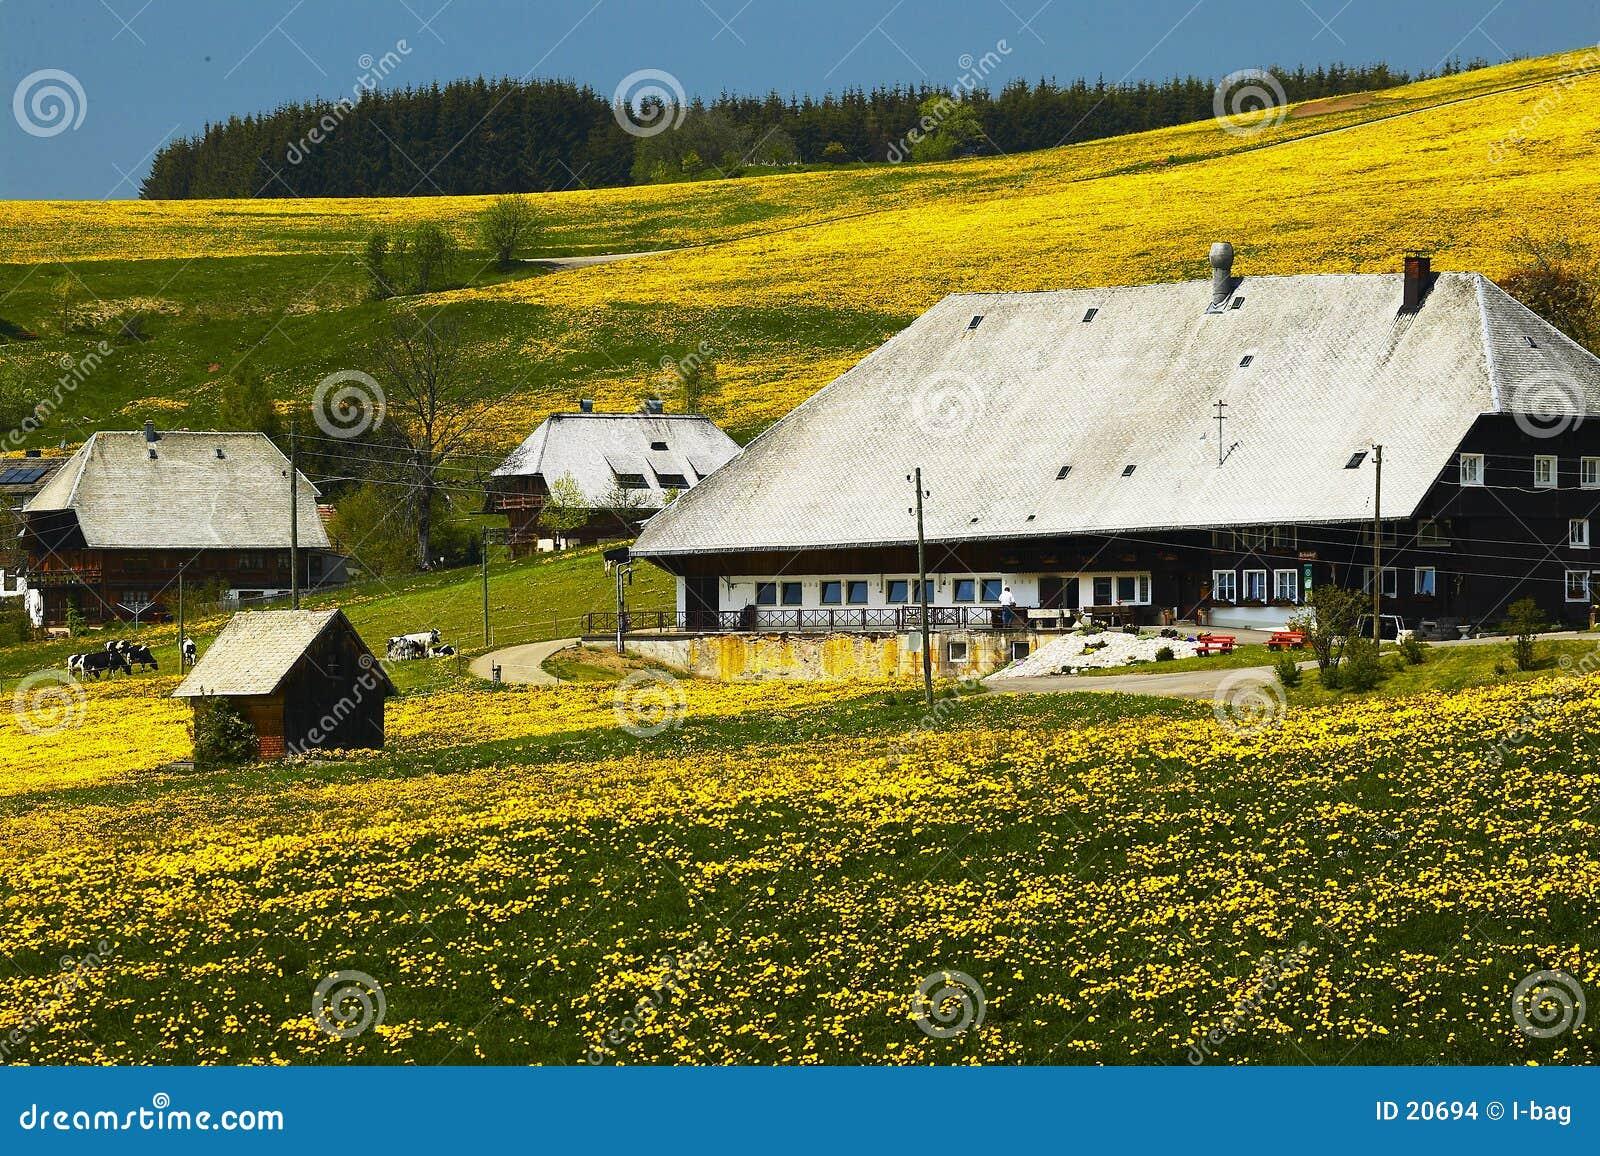 Black forest farmhouse in summer meadow